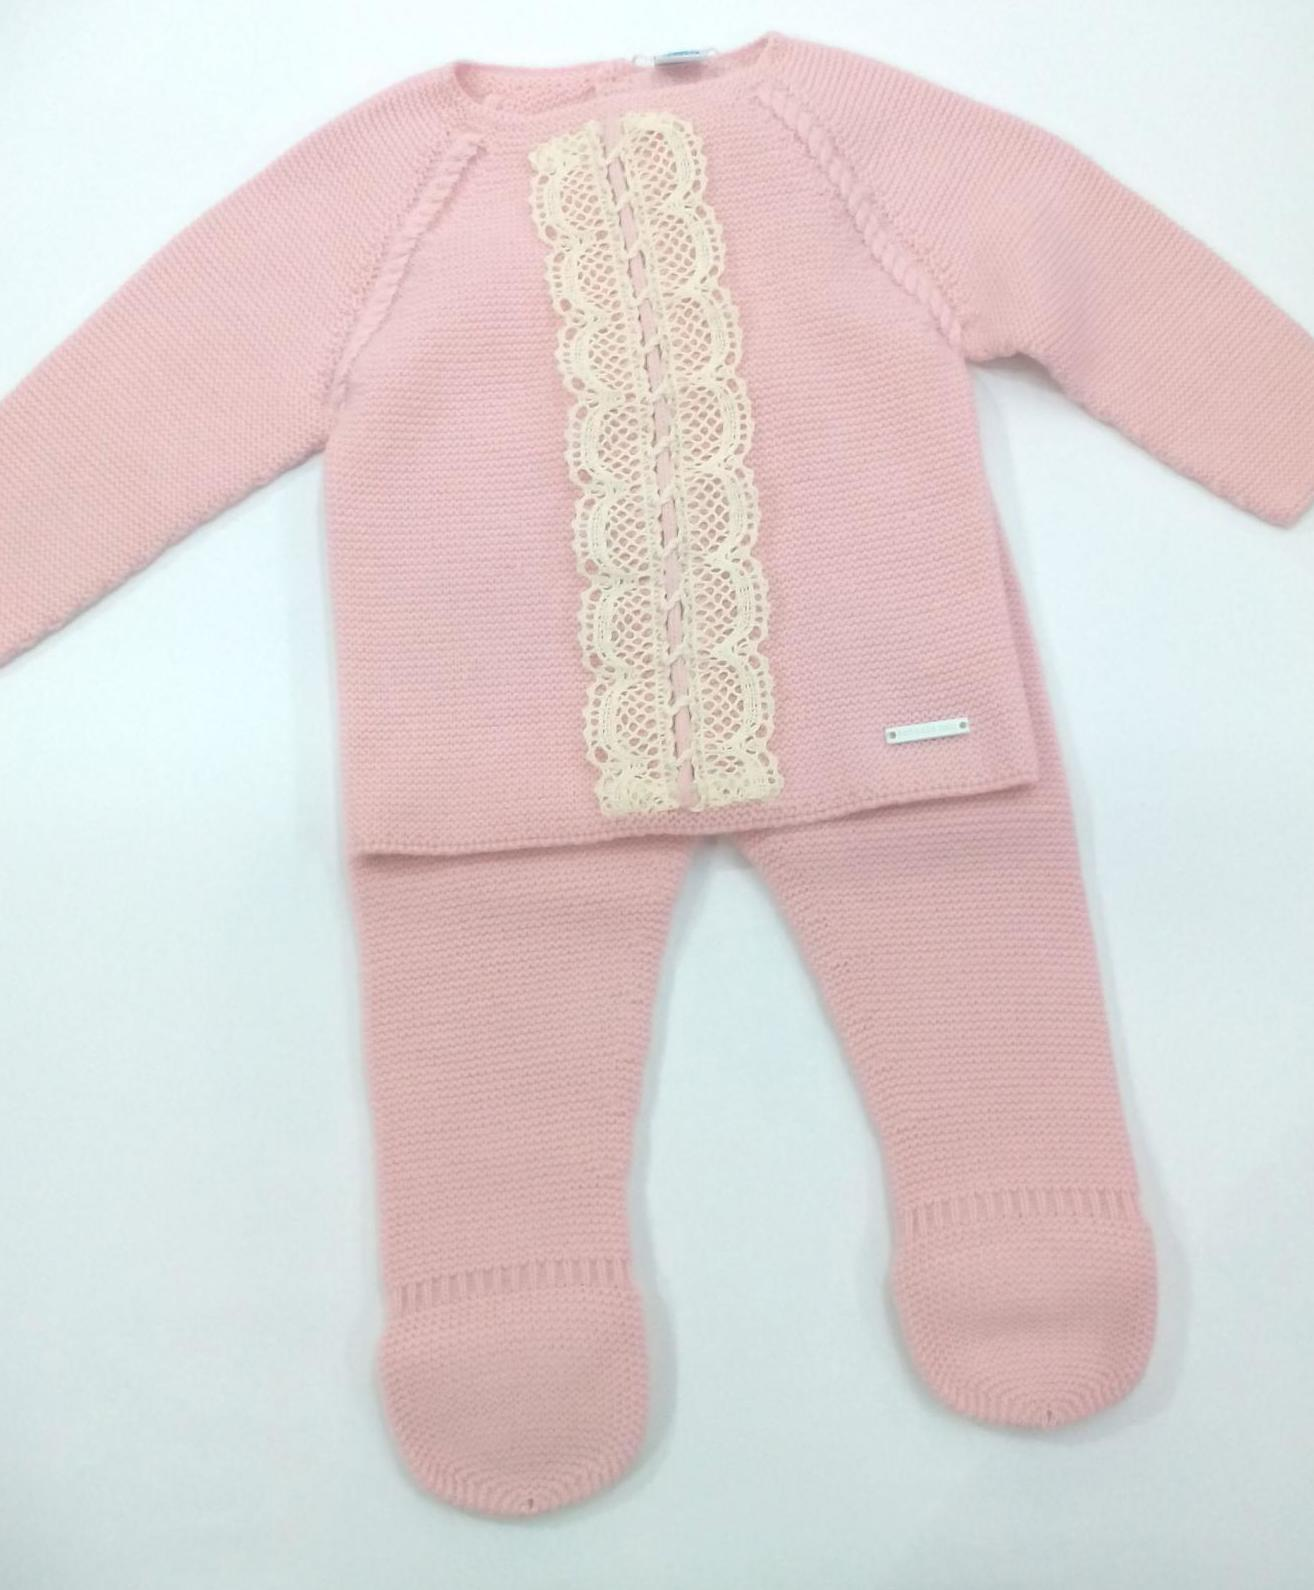 Conjunto de niña de canastilla en rosa empolvado de Pangasa